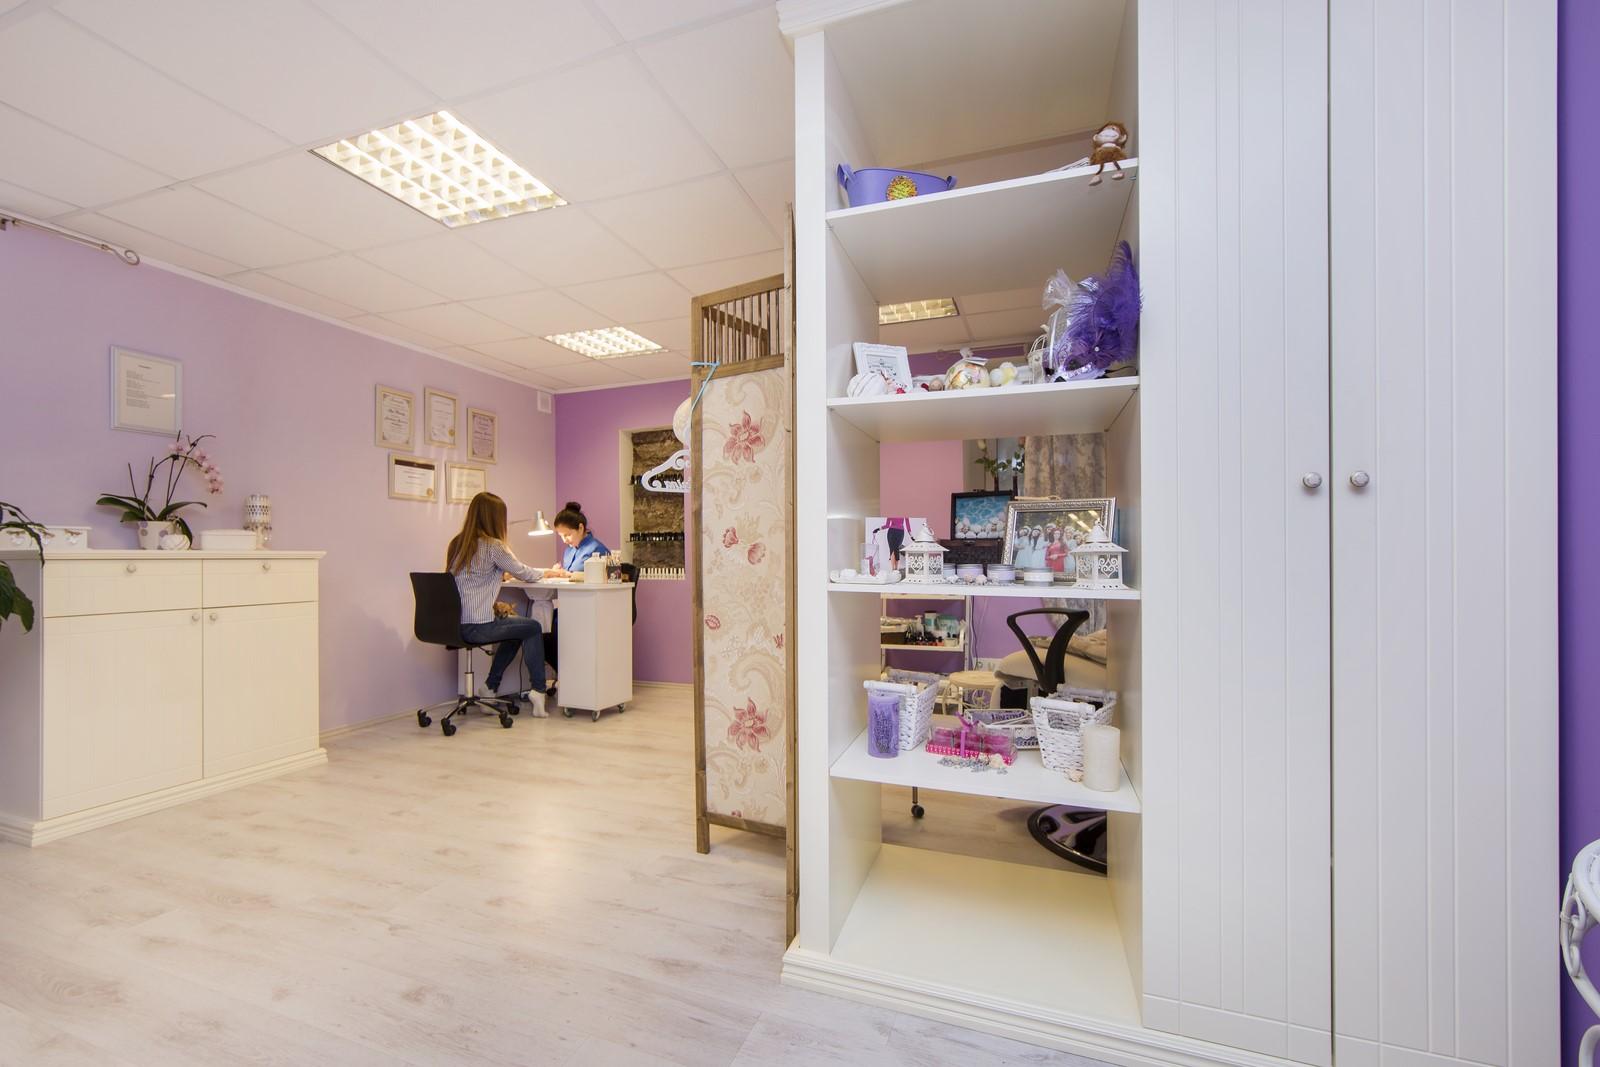 Kosmeetikasalongi mööbel